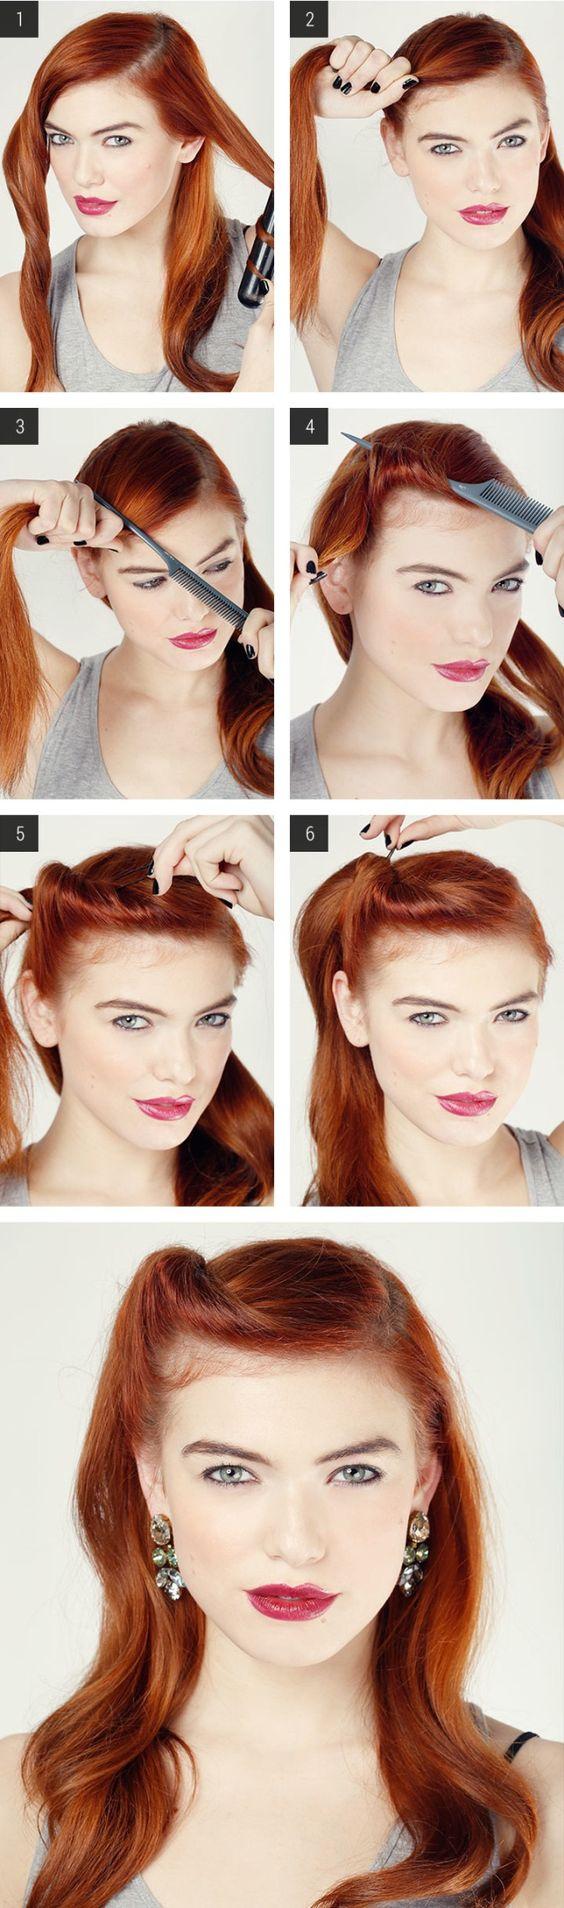 Easy-step-by-step-Retro-Hair-Tutorials Elegant Retro Hairstyles 2019 – Vintage Hairstyles for Women